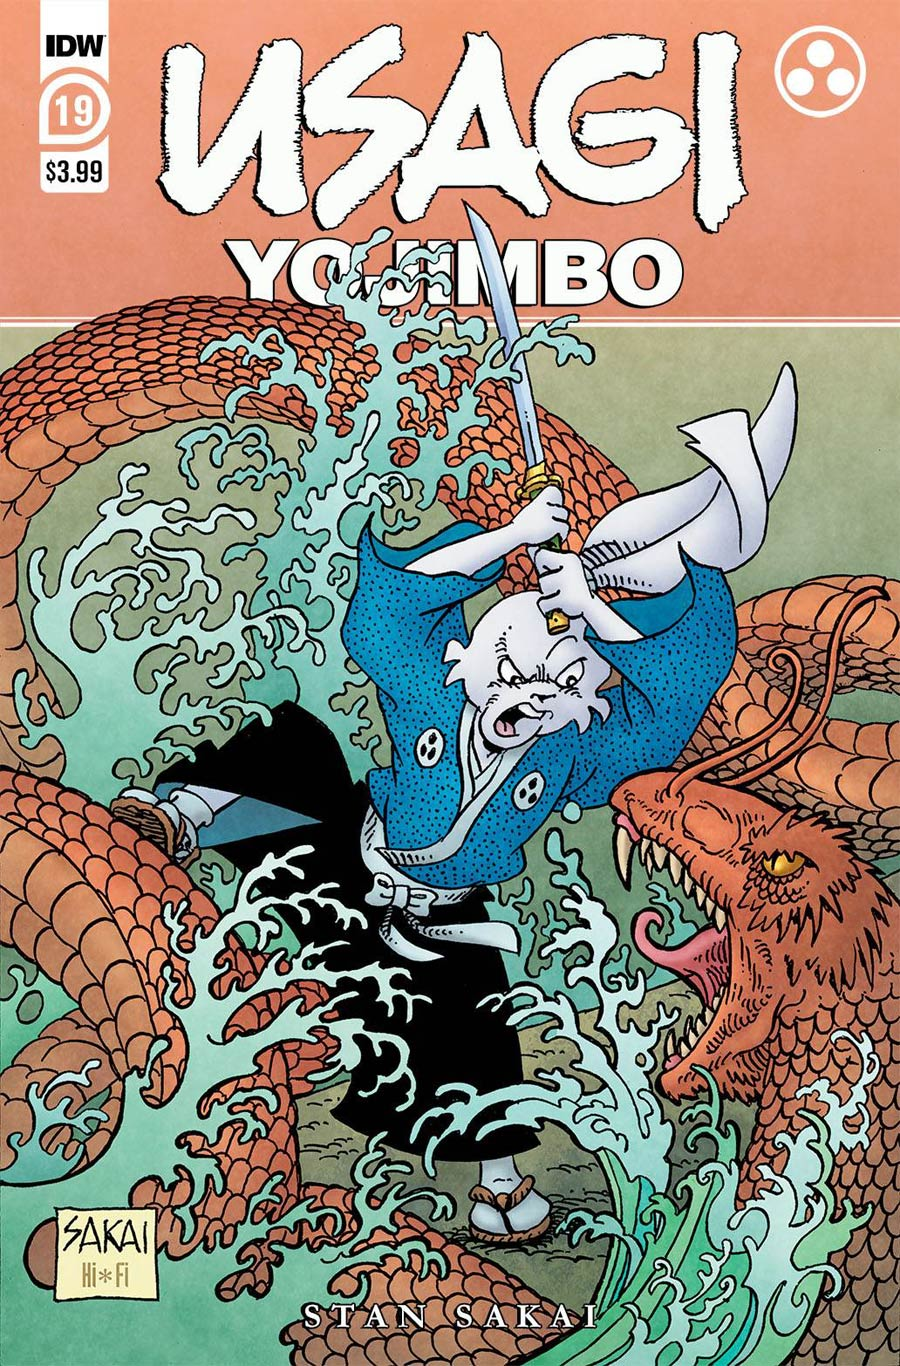 Usagi Yojimbo Vol 4 #19 Cover A Regular Stan Sakai Cover